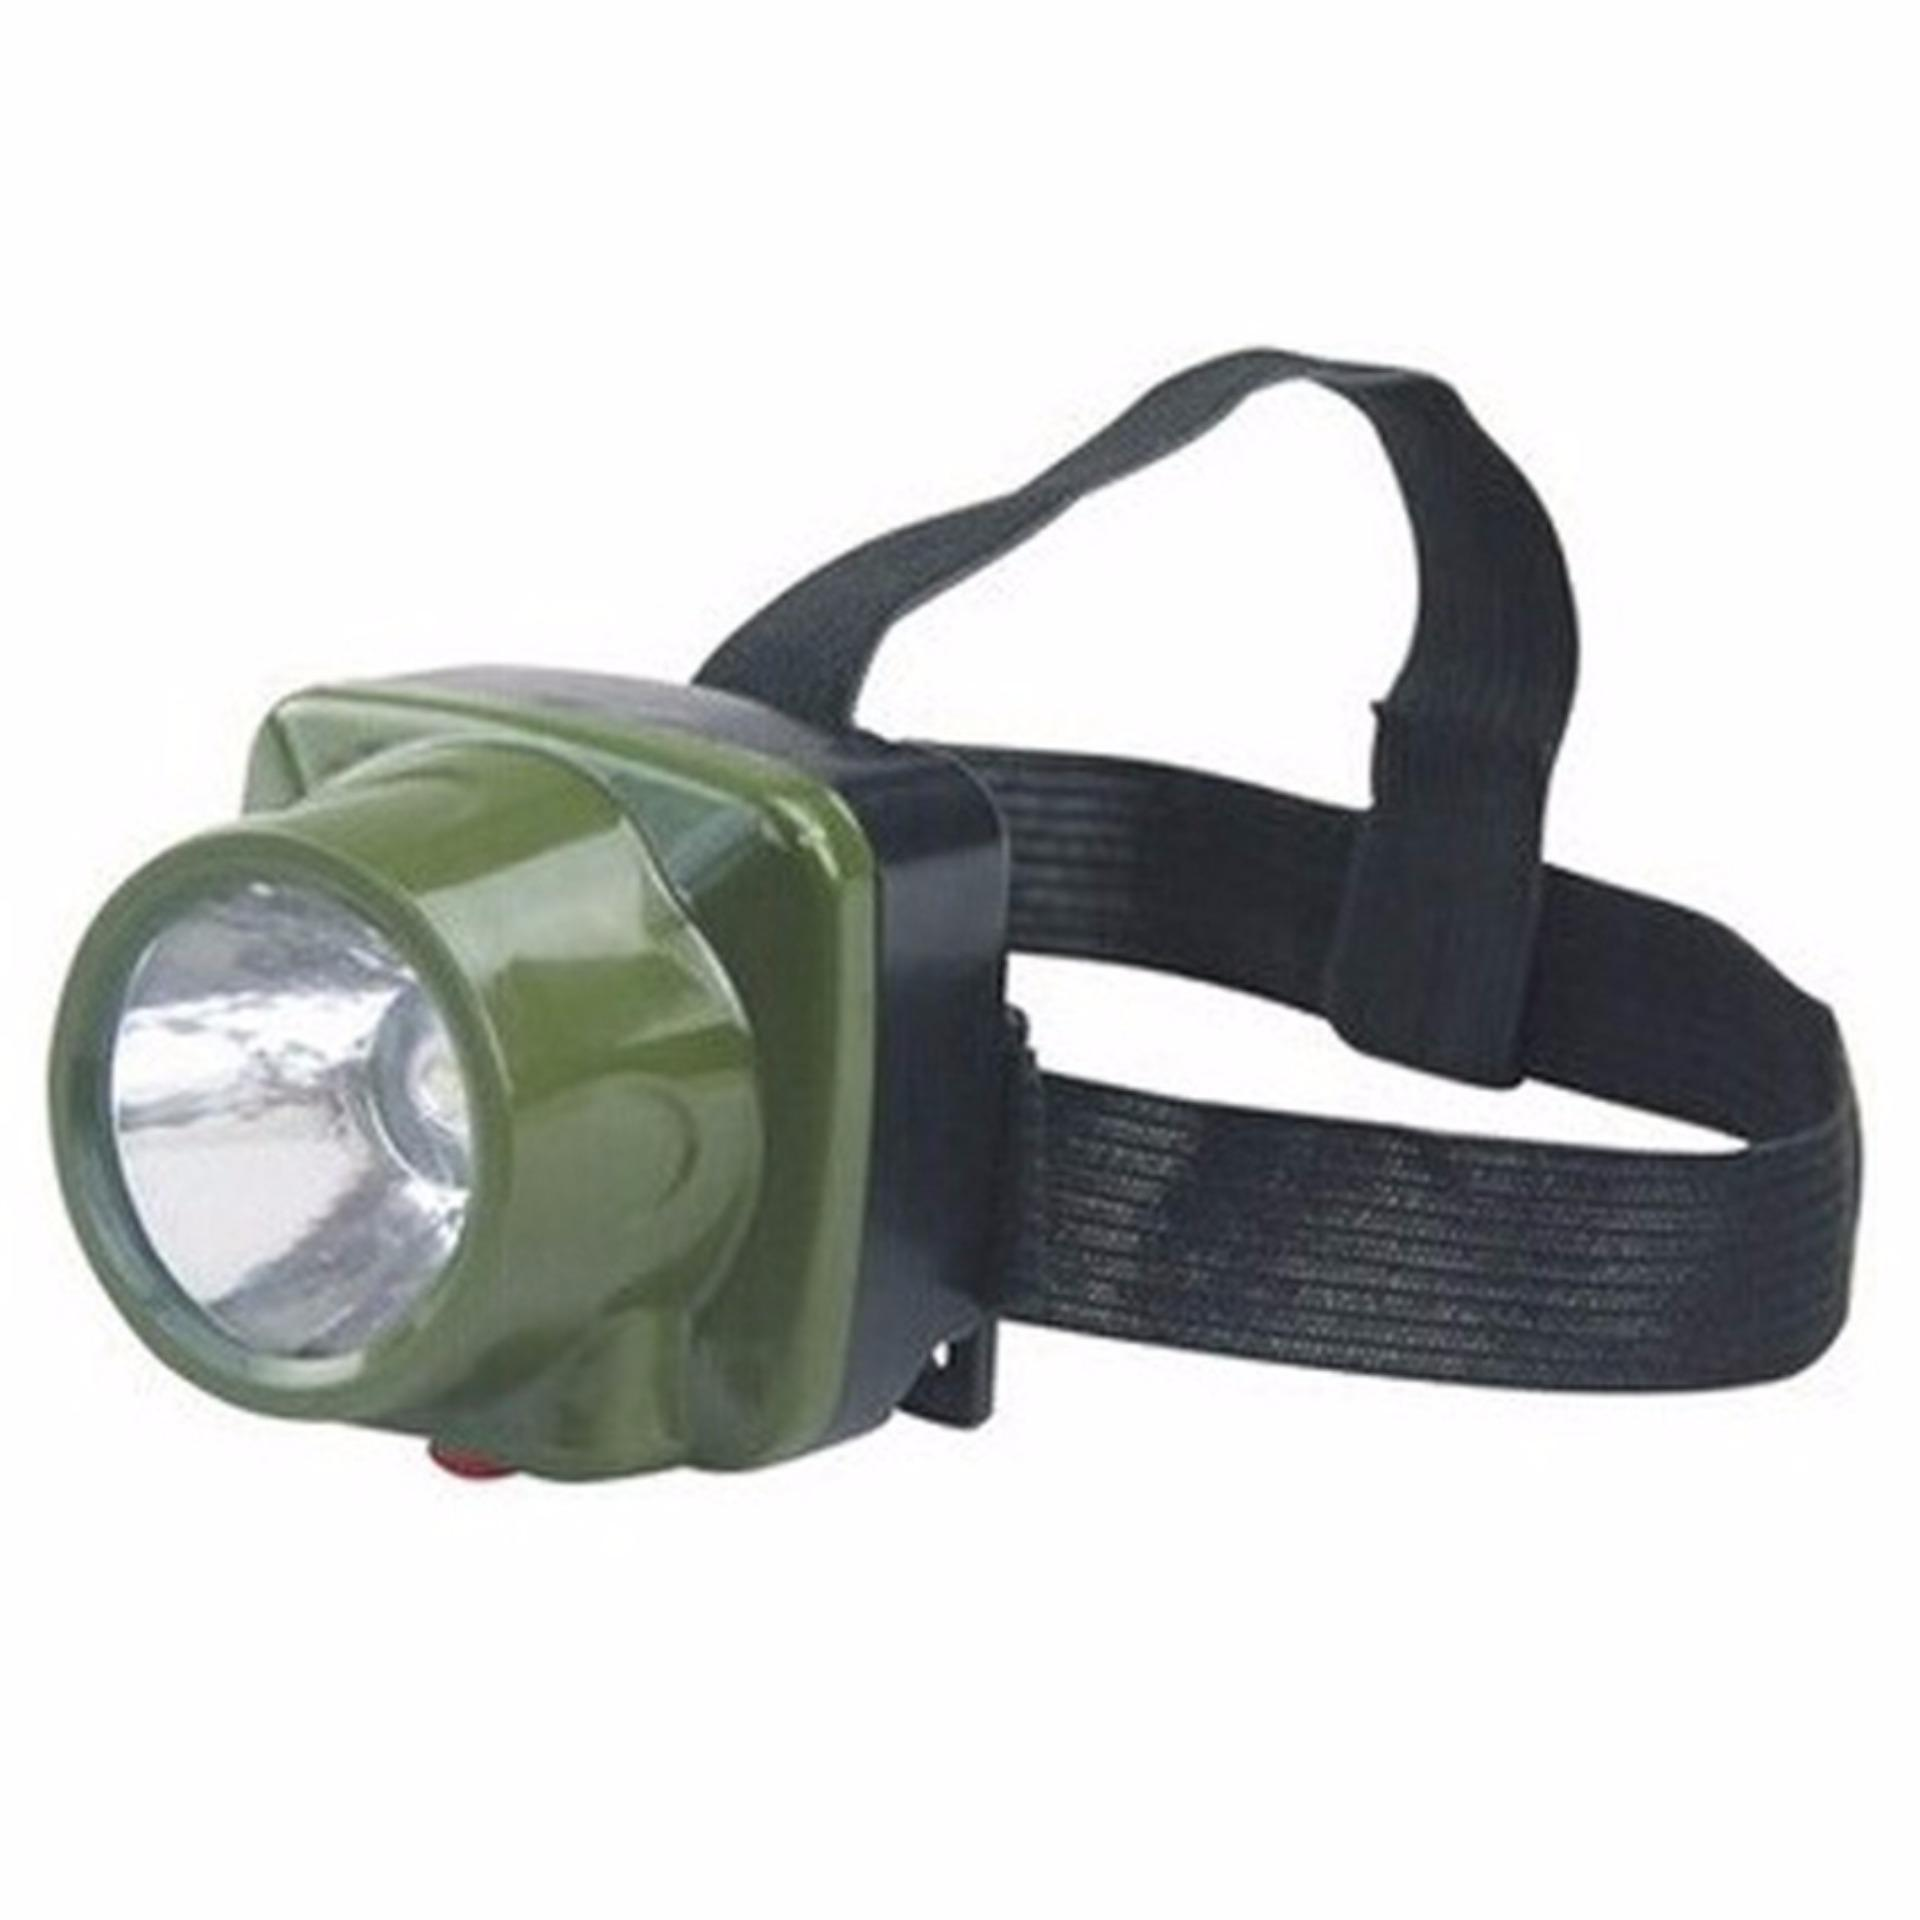 Rp 29.900. Eigia Lampu Senter Kepala Headlamp LED ...